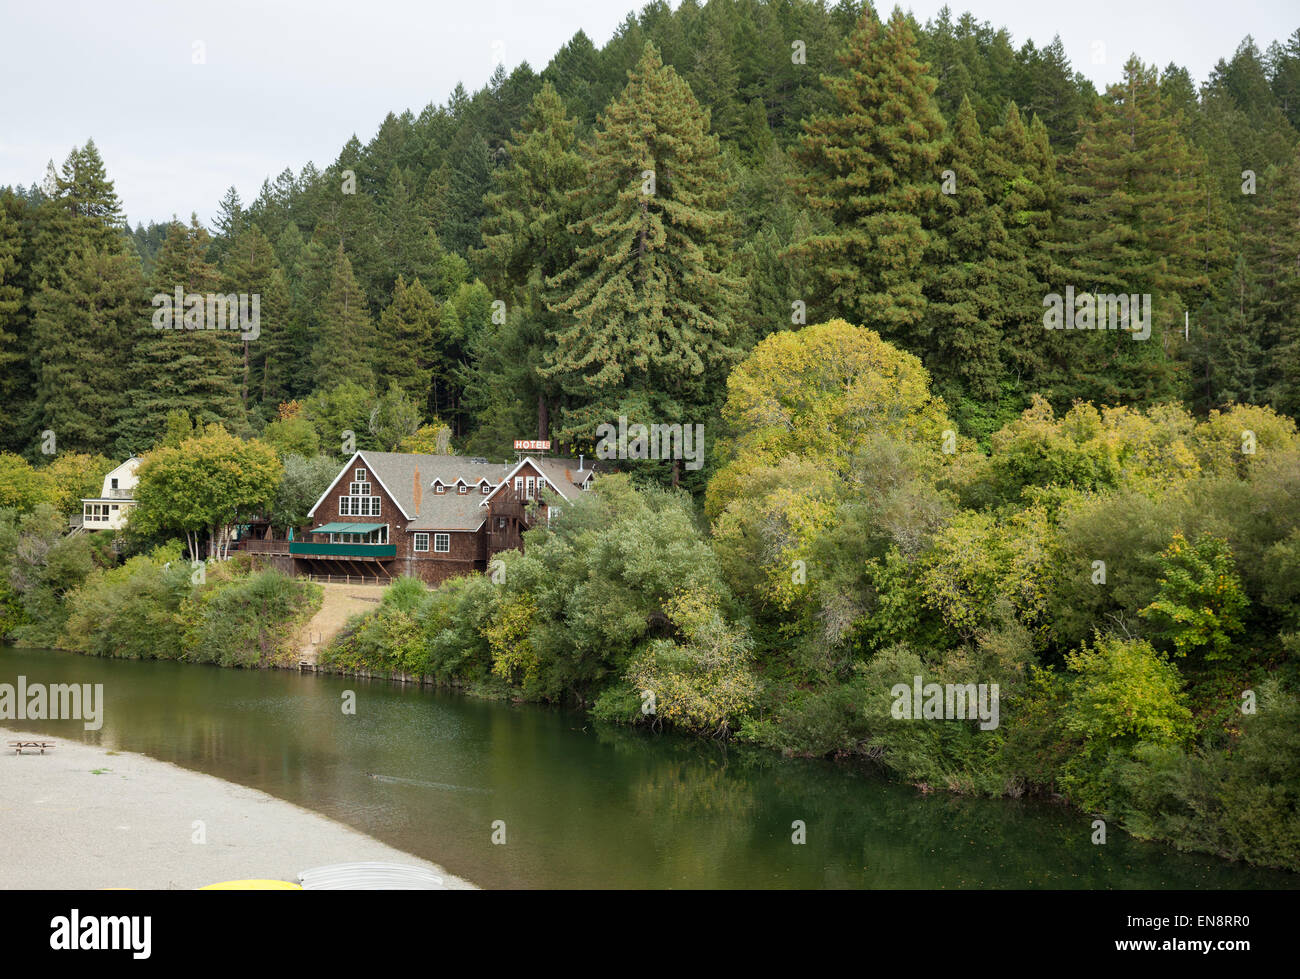 The Highland Dell Lodge on the Russian River in Monte Rio California. - Stock Image